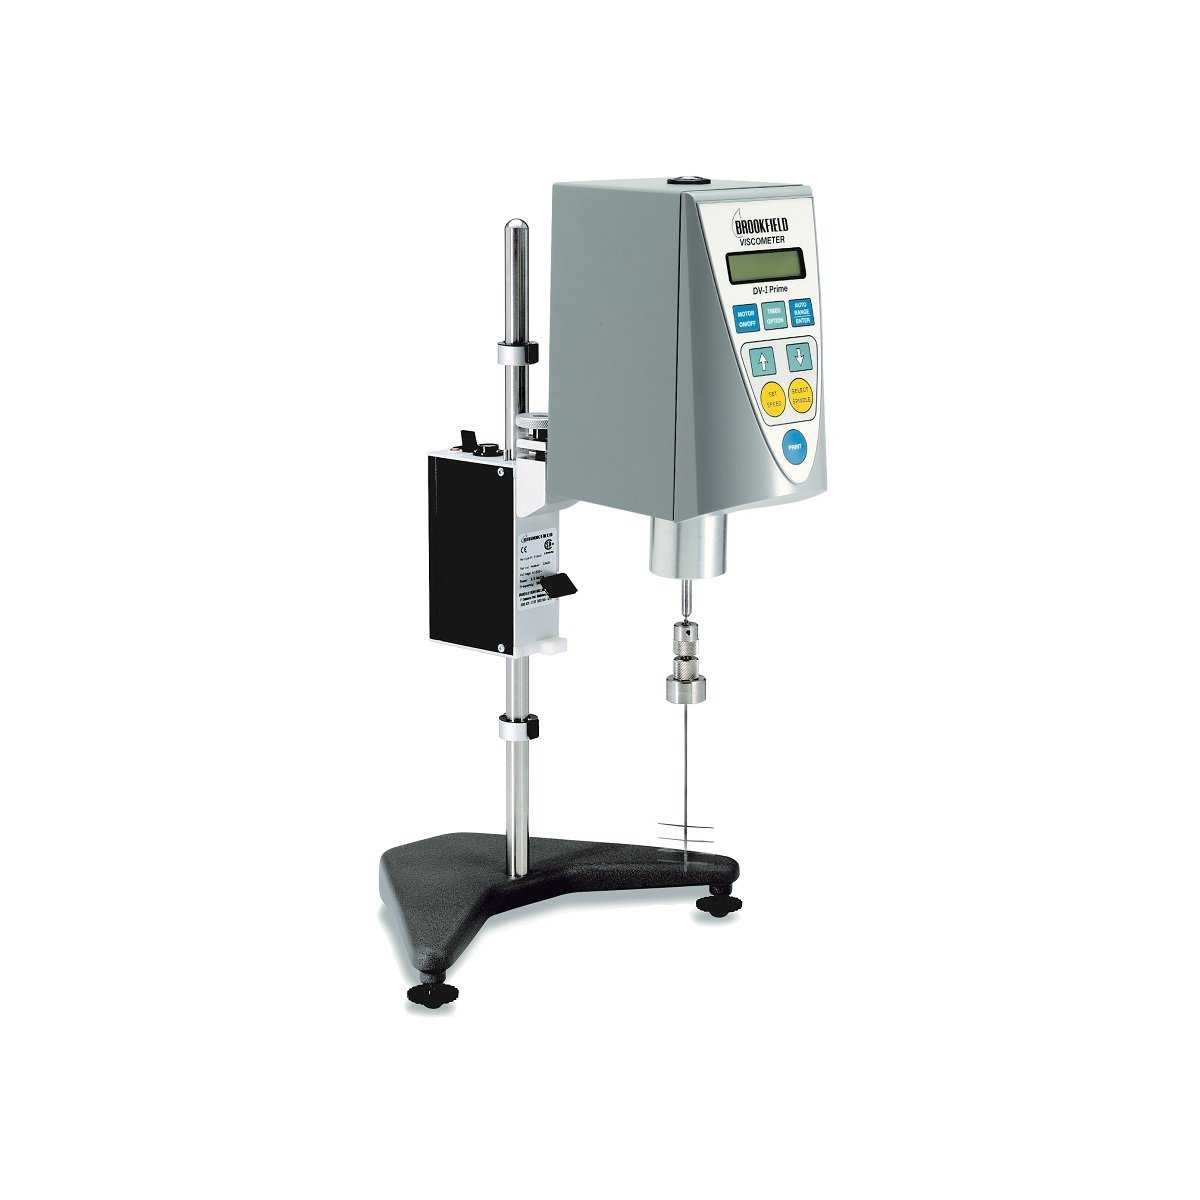 BYK-Gardner 4892 Brookfield Viscometer Helipath Stand, 115V/60 Hz